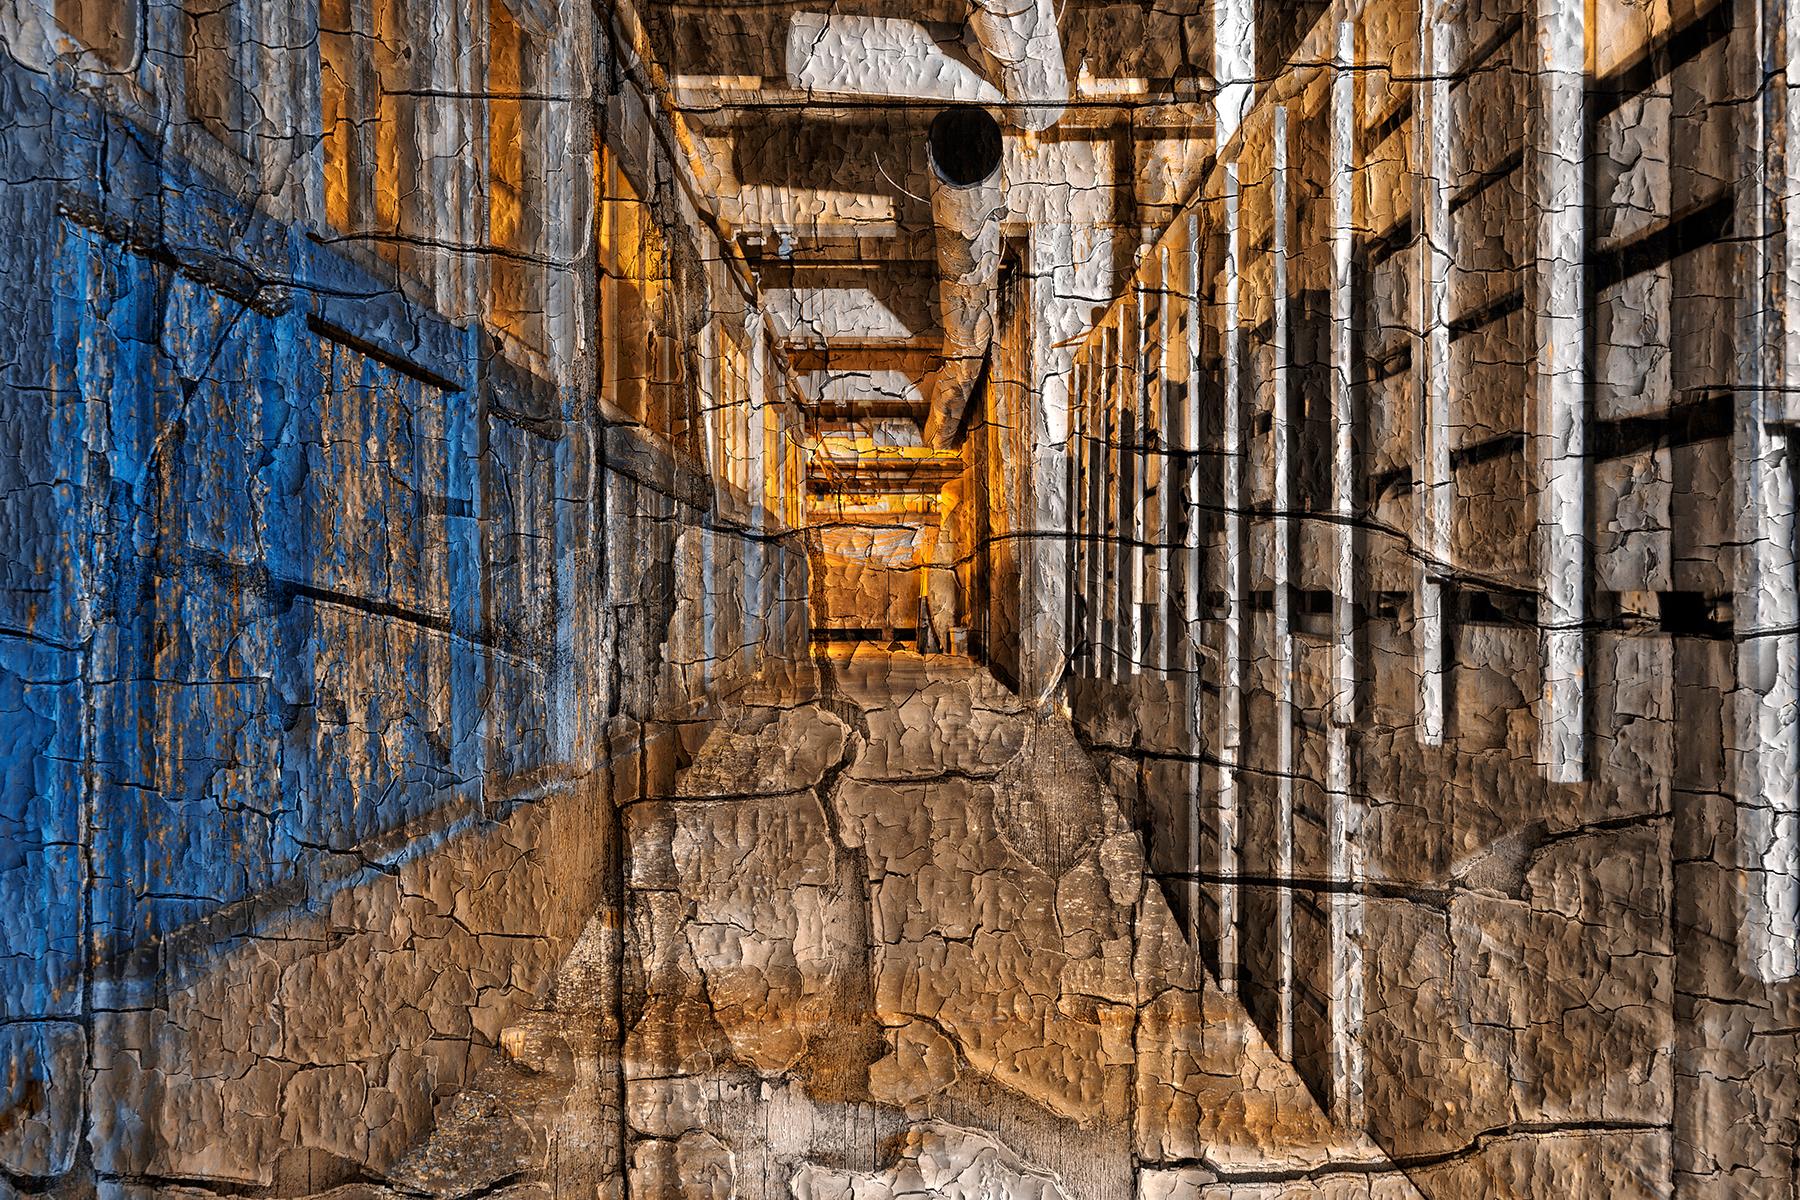 Cracked Urbex Corridor, Abandoned, Scene, Rustic, Rough, HQ Photo